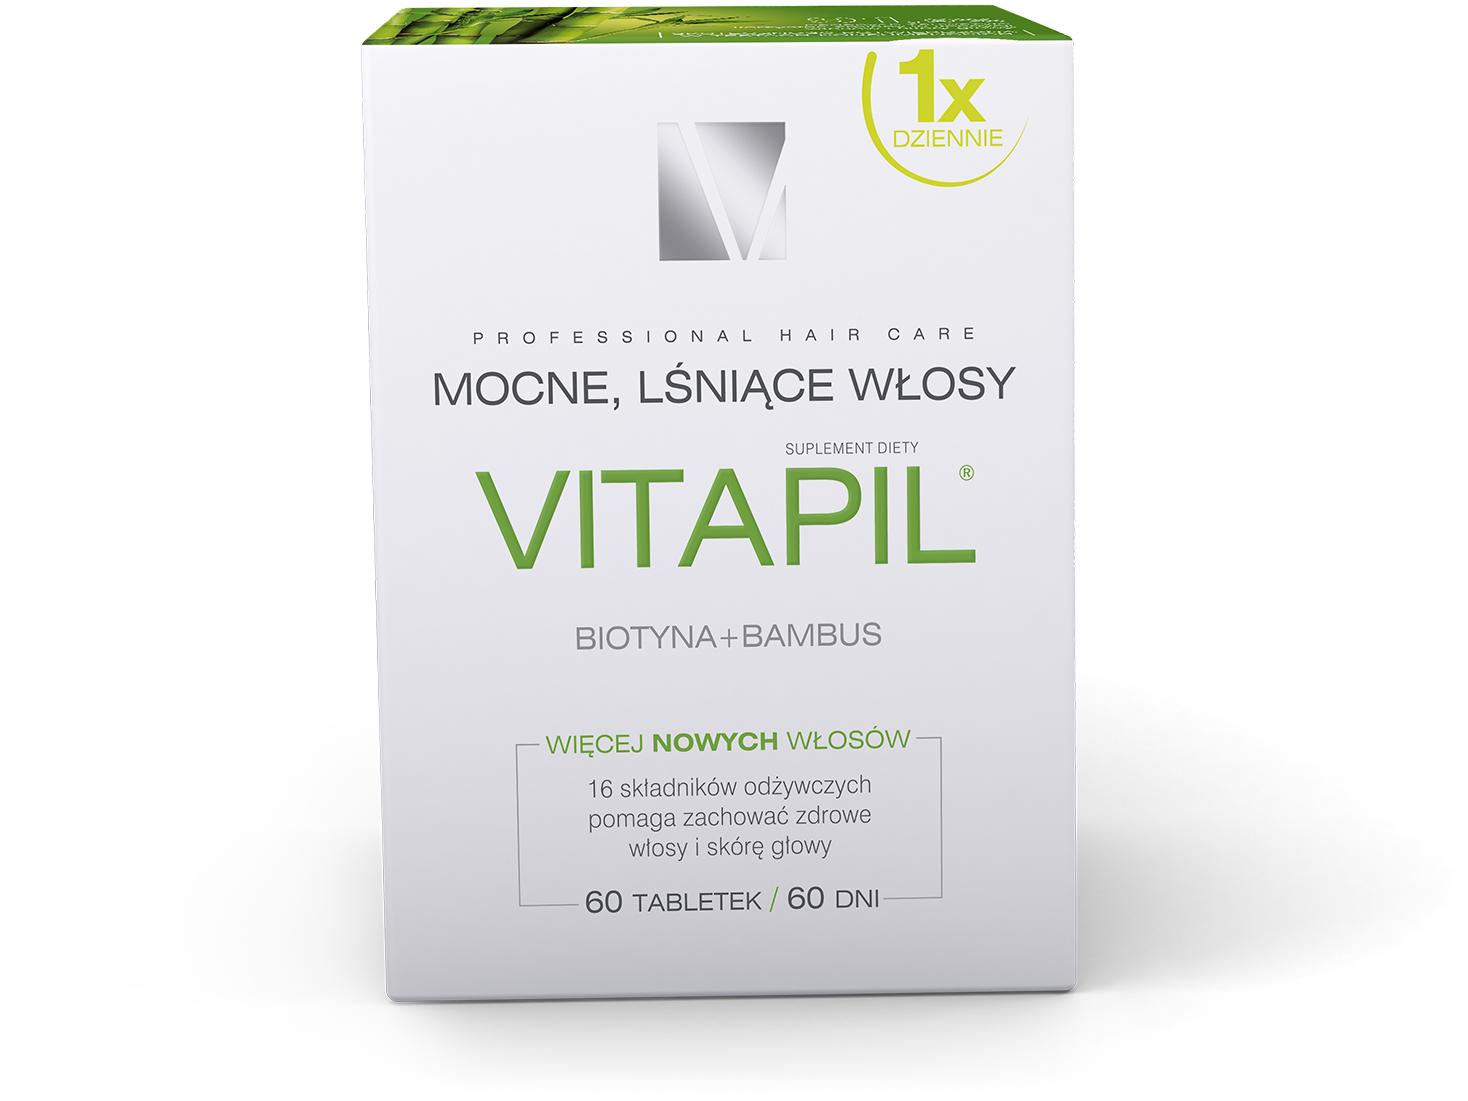 Znalezione obrazy dla zapytania vitapil